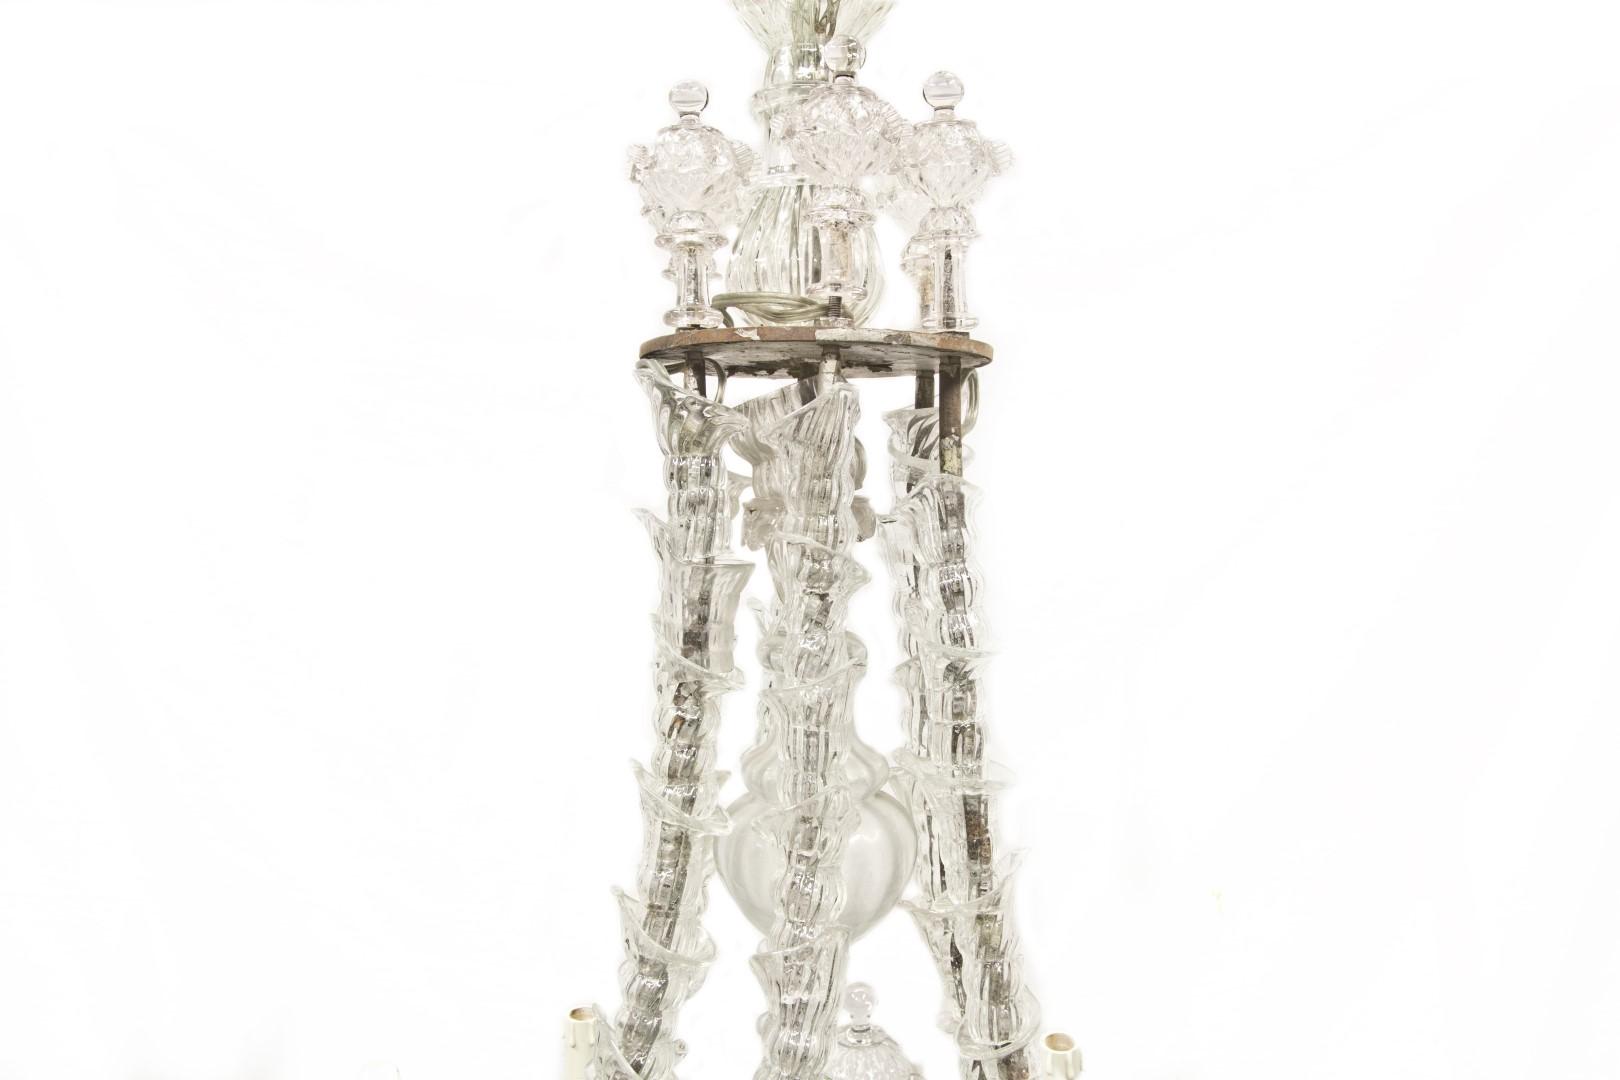 lampadari firenze : Lampadari antichi in vetro - Albrici Firenze